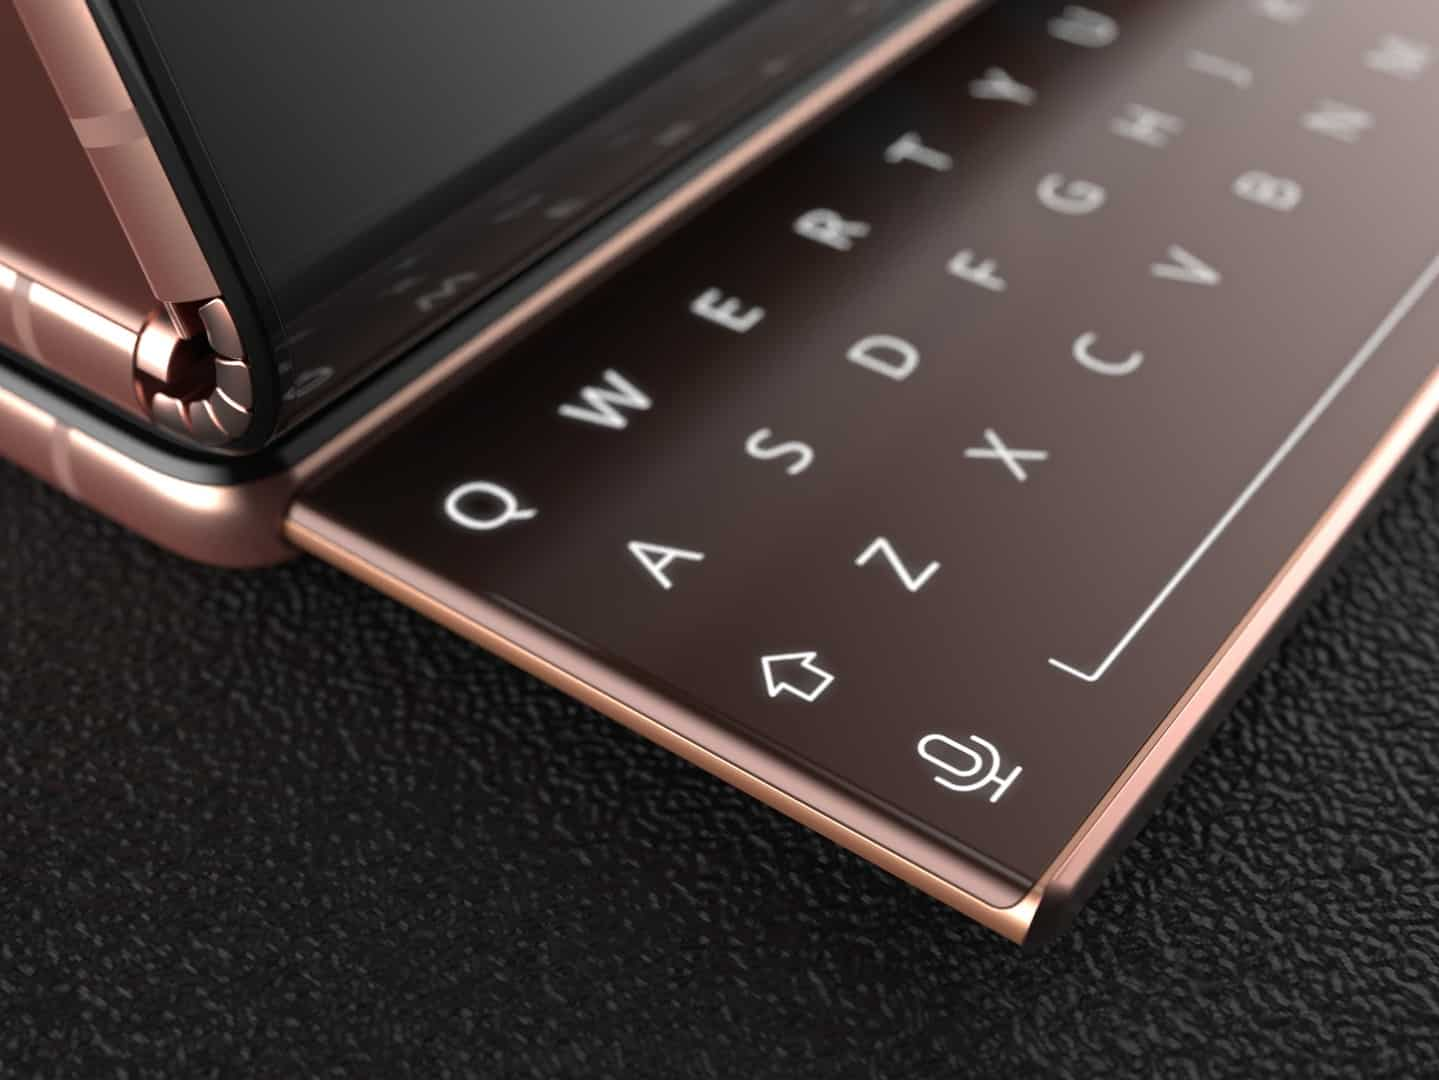 Samsung Galaxy Z Fold with sliding keyboard 5